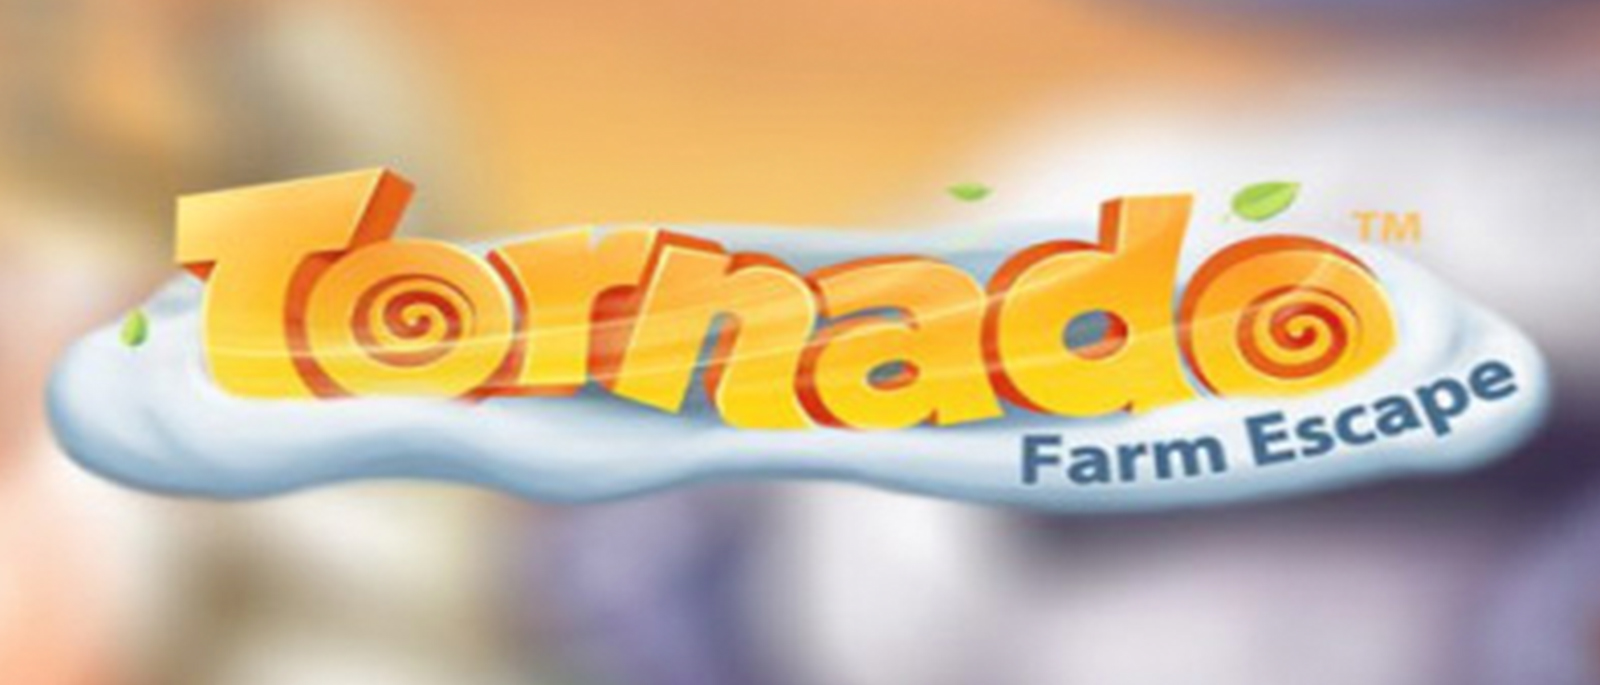 Tornado Farm -684642